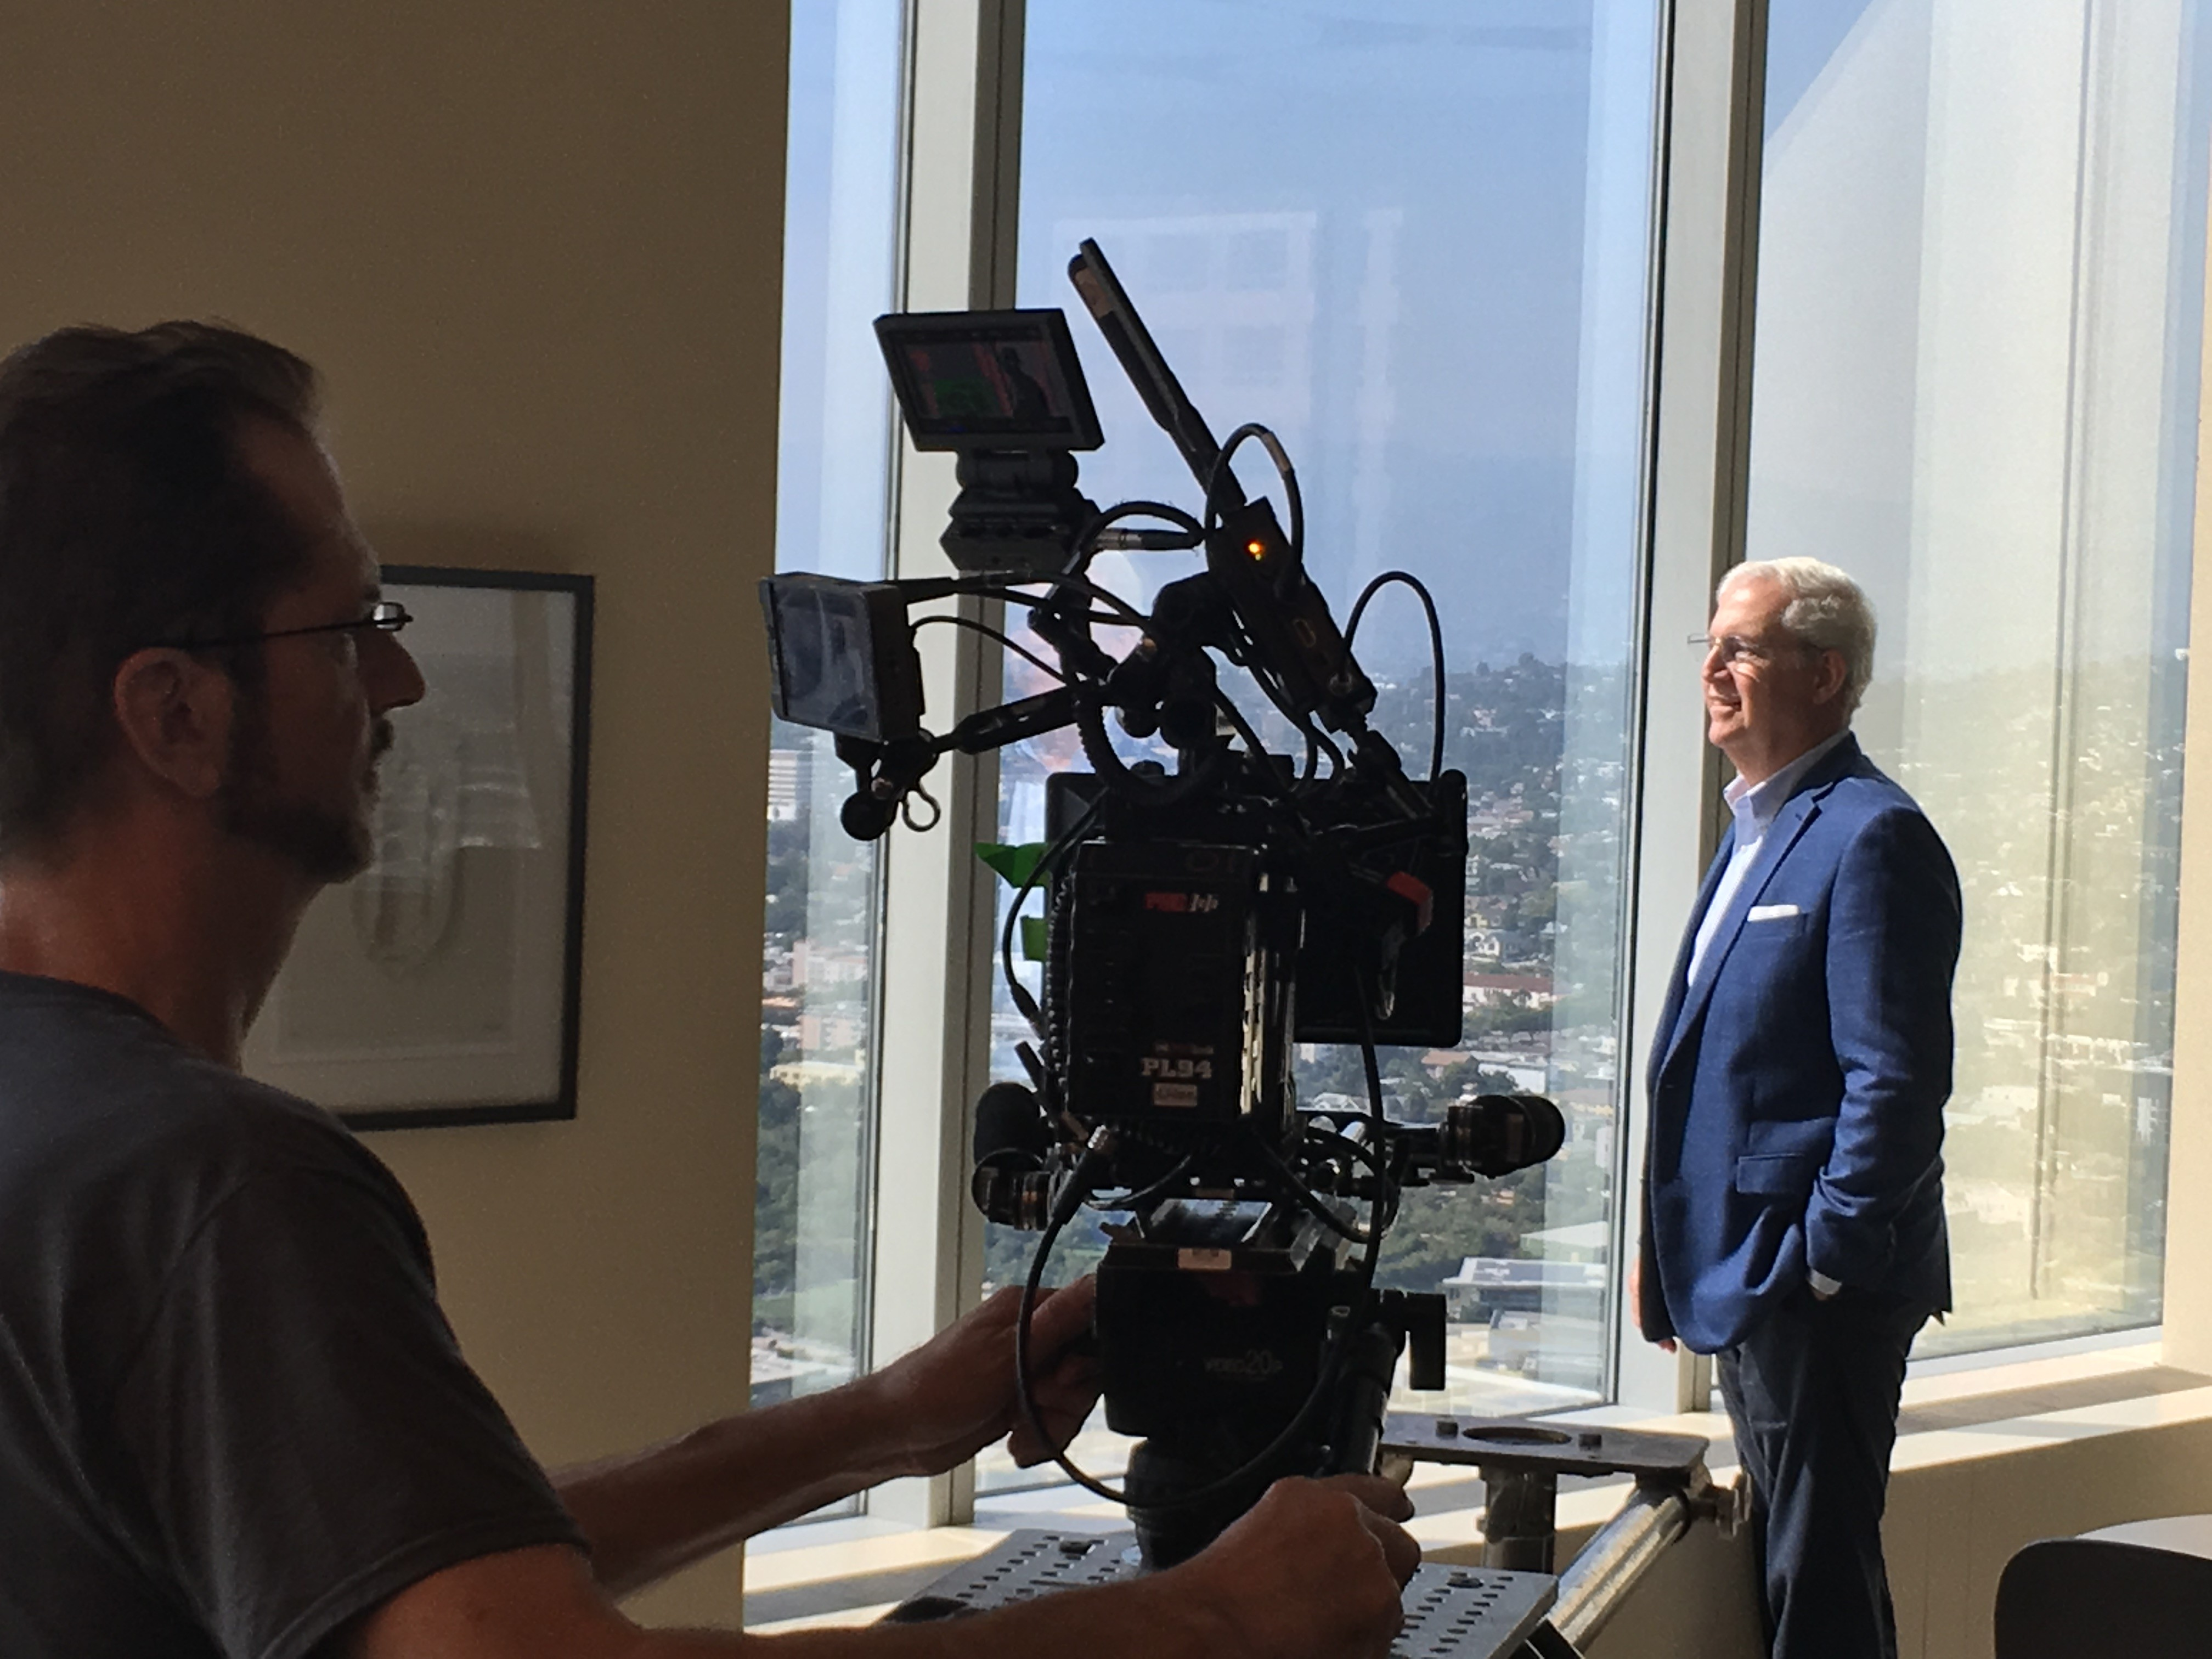 The Economist prepares to profile LA's entrepreneurial scene, interviews Bill Allen